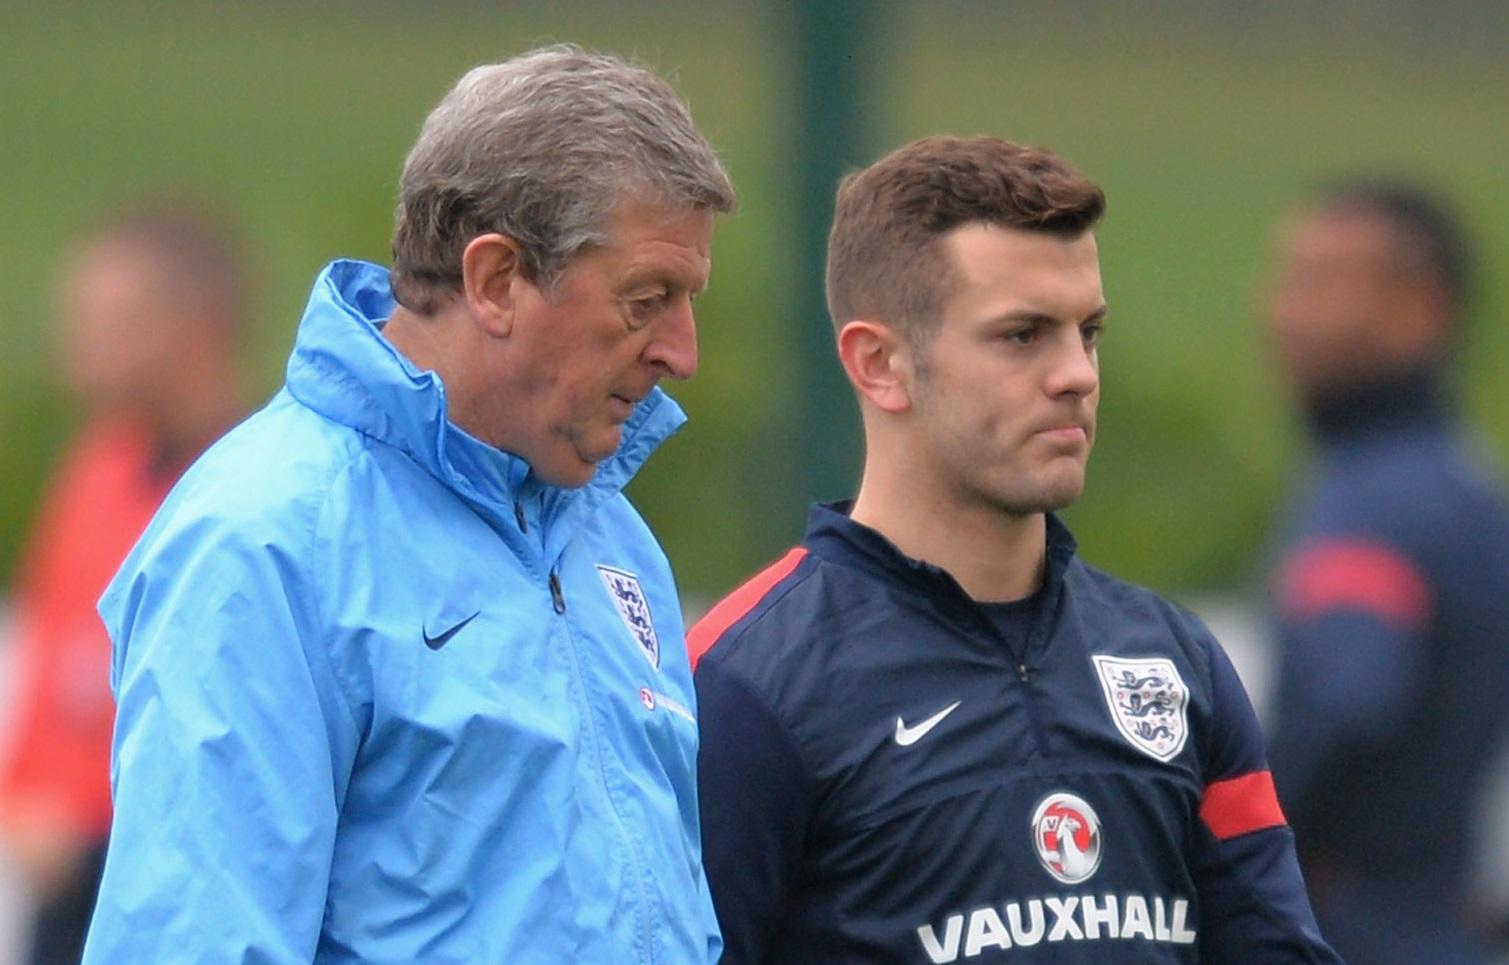 England manager Roy Hodgson defends Arsenal midfielder Jack Wilshere smoking